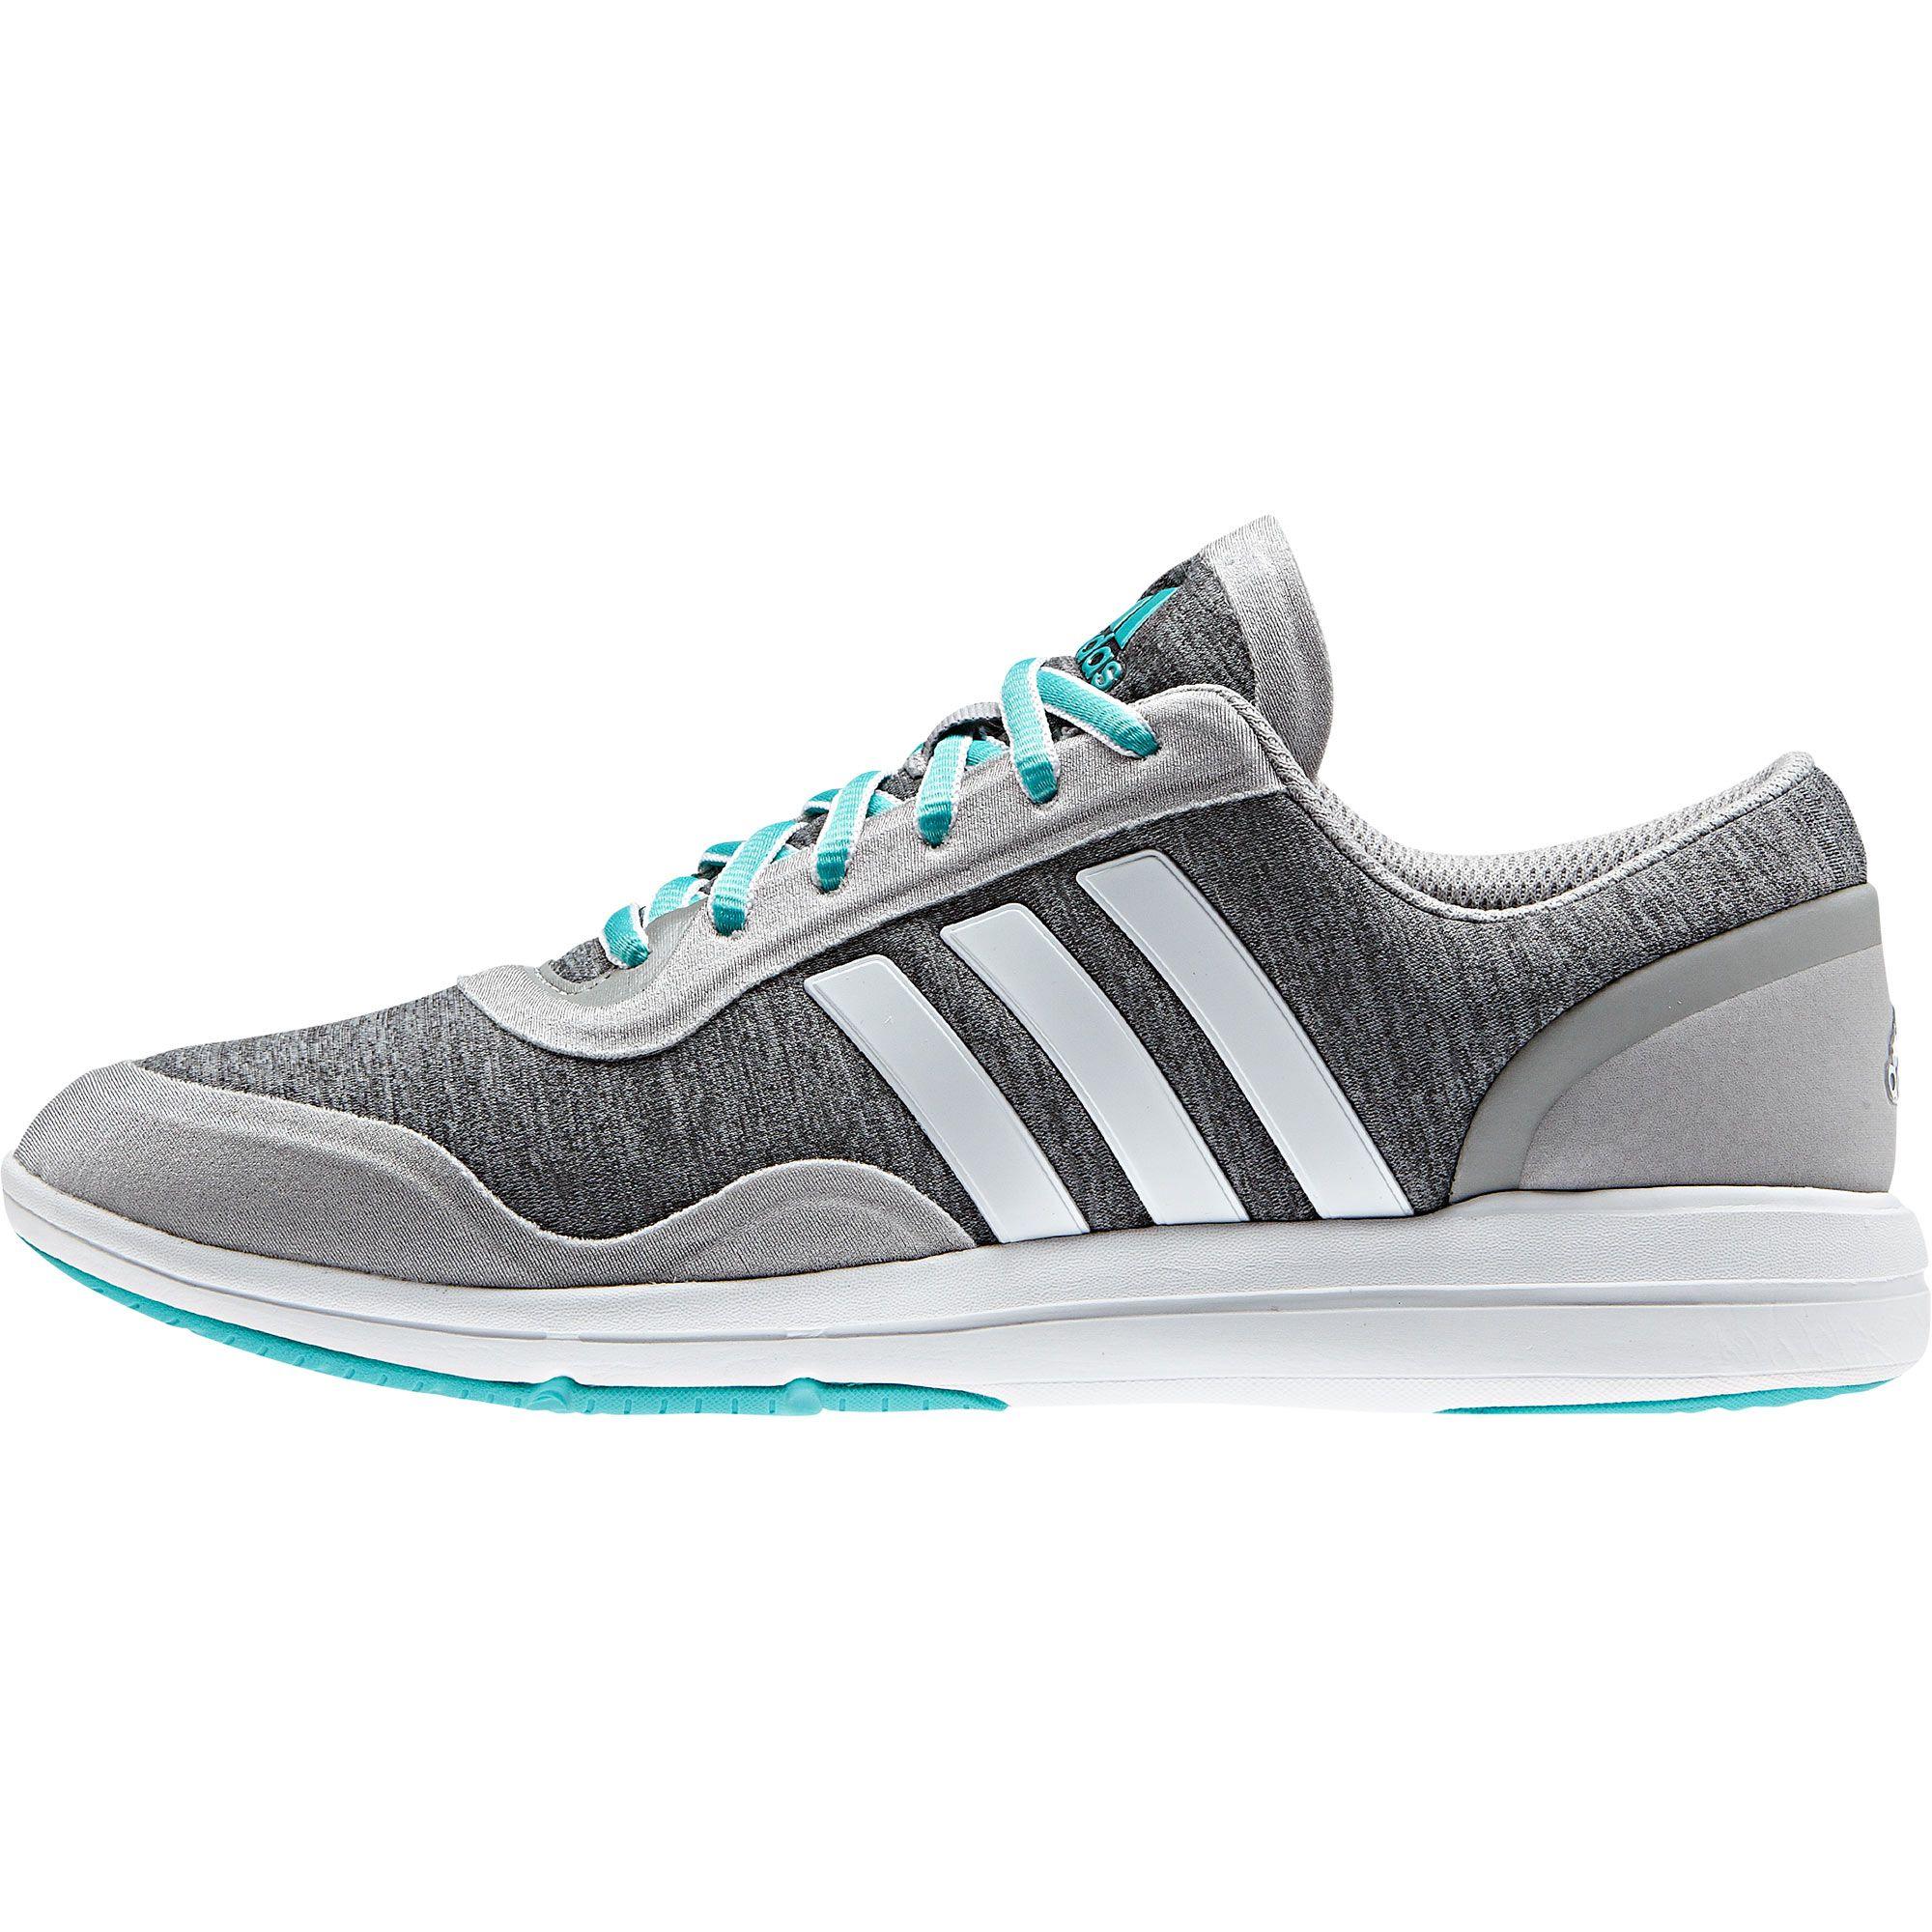 mx Ayari Todos De Descubre Mujer Adidas Entrenamiento En Zapatos 7qnUxTCawS